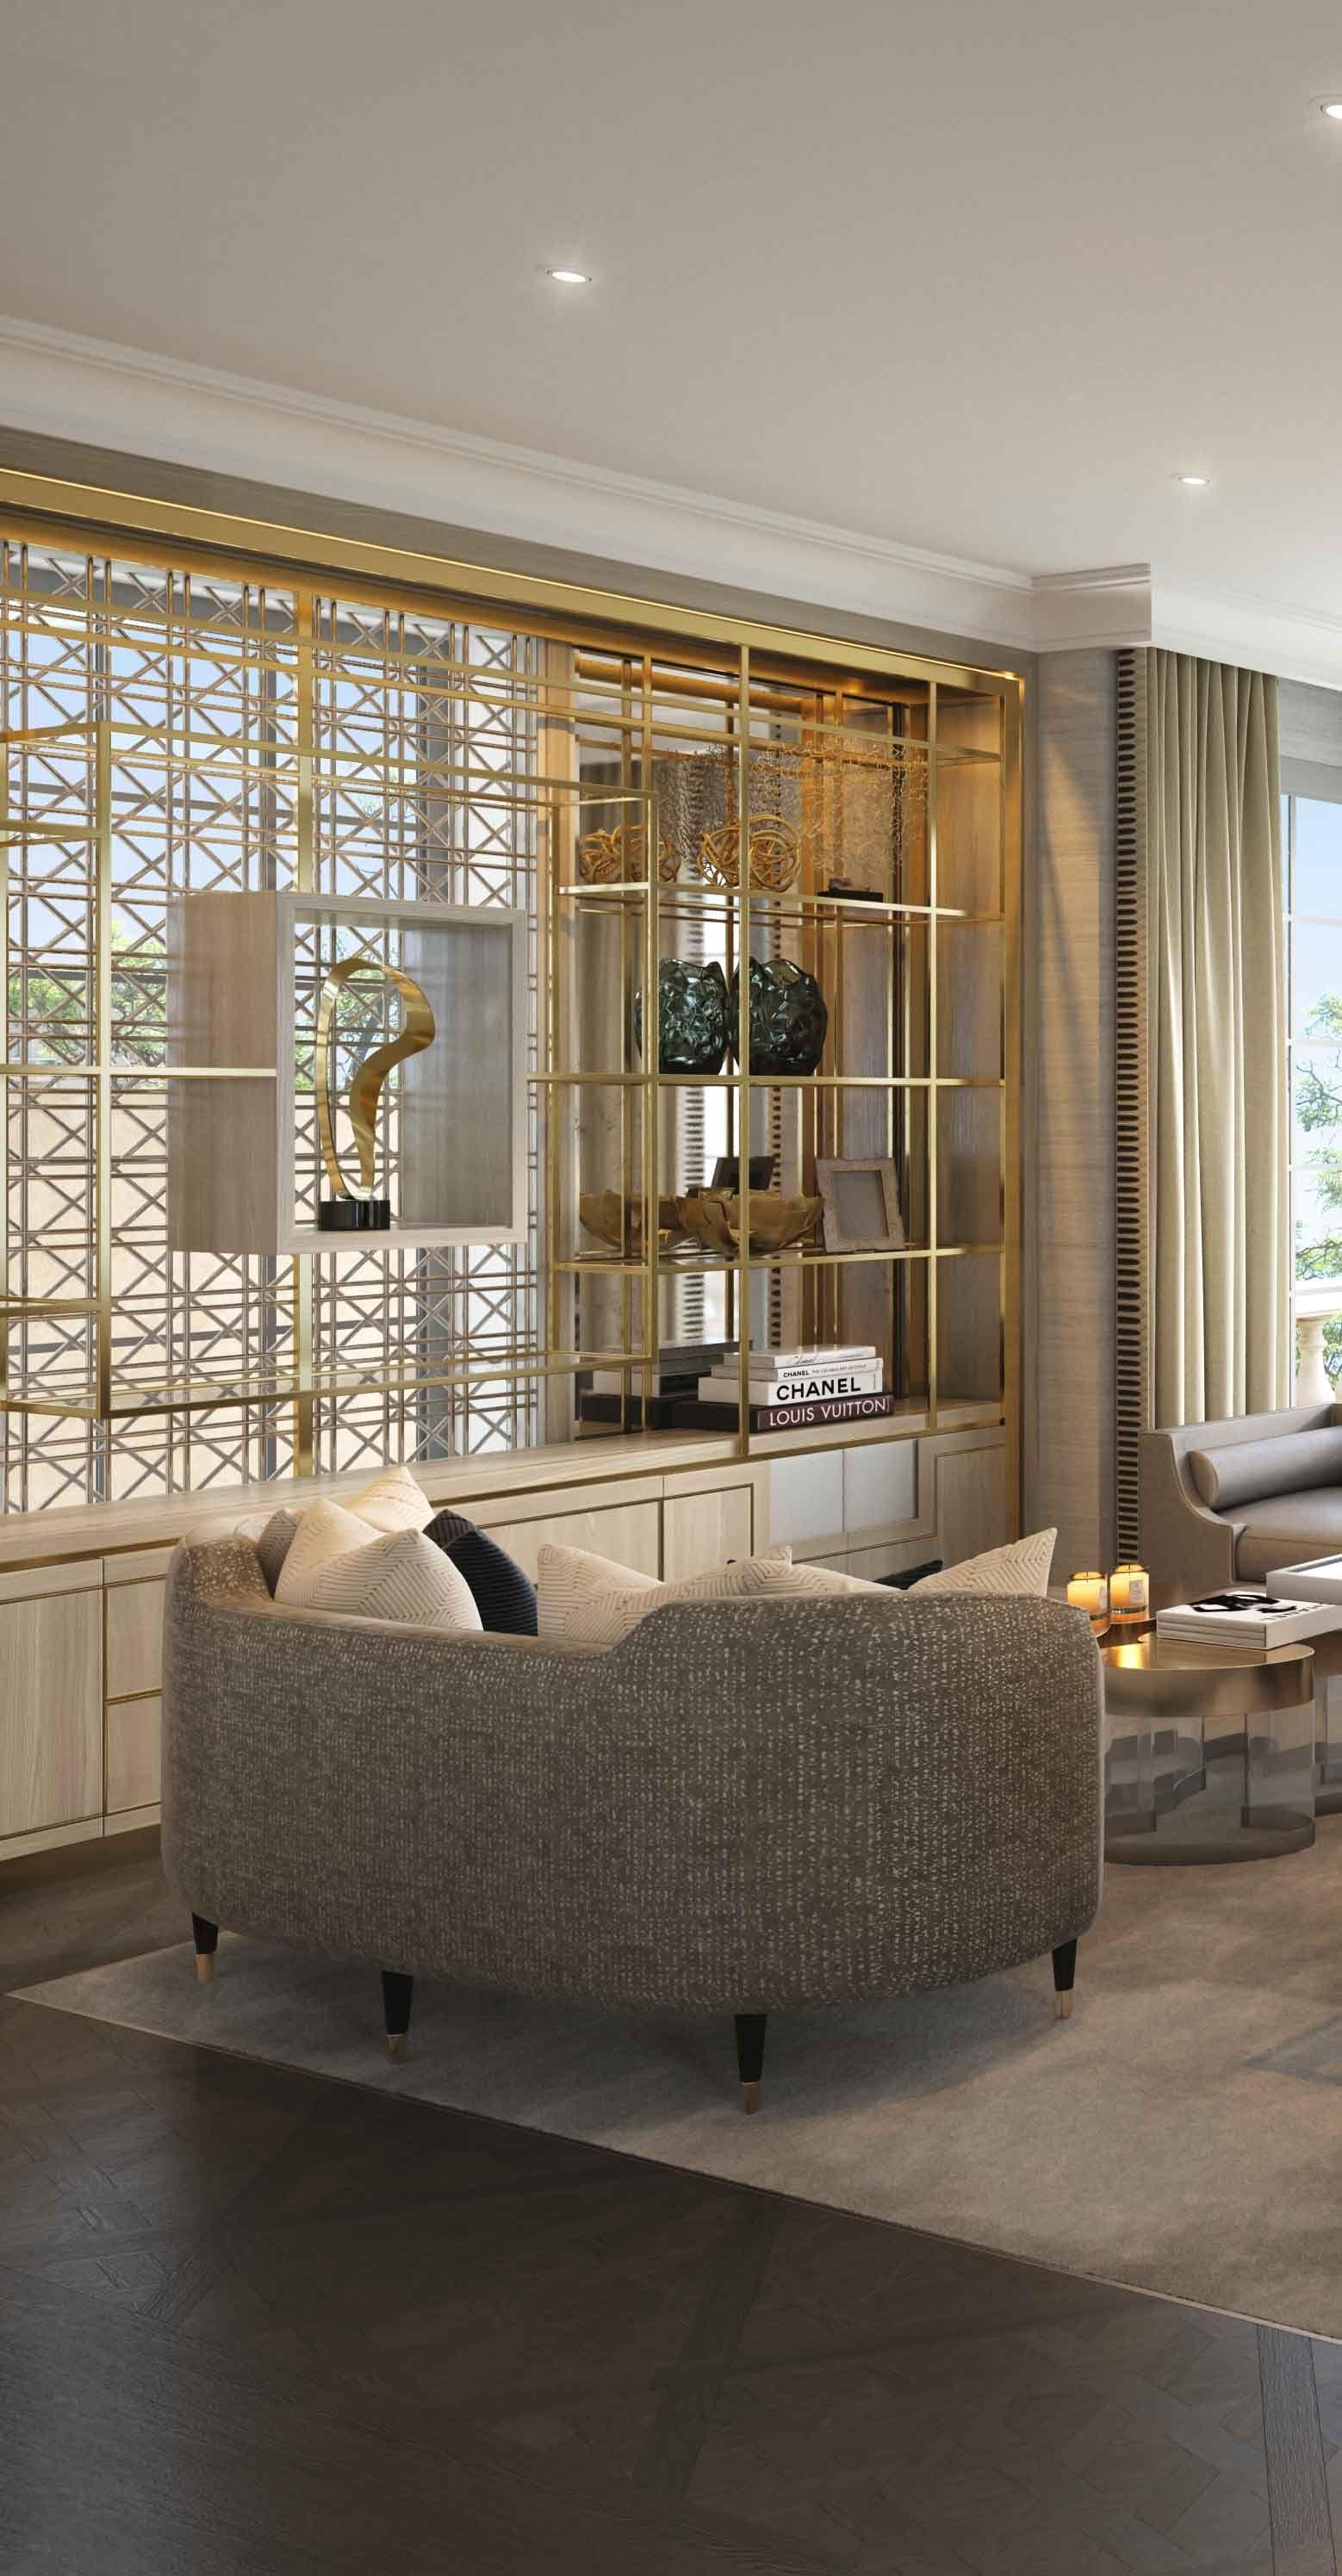 Living Room Trends For 2016 Inspirations Ideas Living Room Trends Interior Home Decor